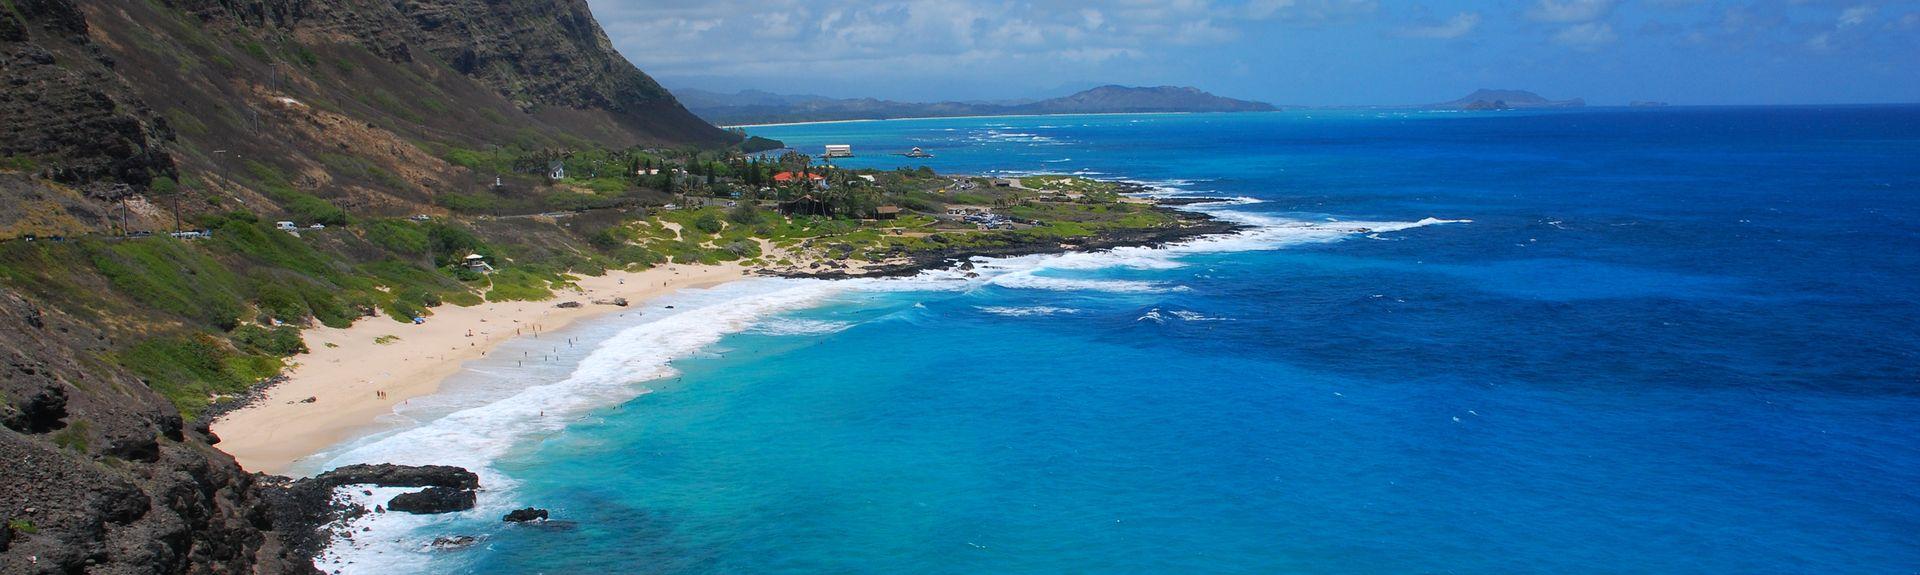 Mamala Bay Golf Course, Joint Base Pearl Harbor-Hickam, Hawaii, United States